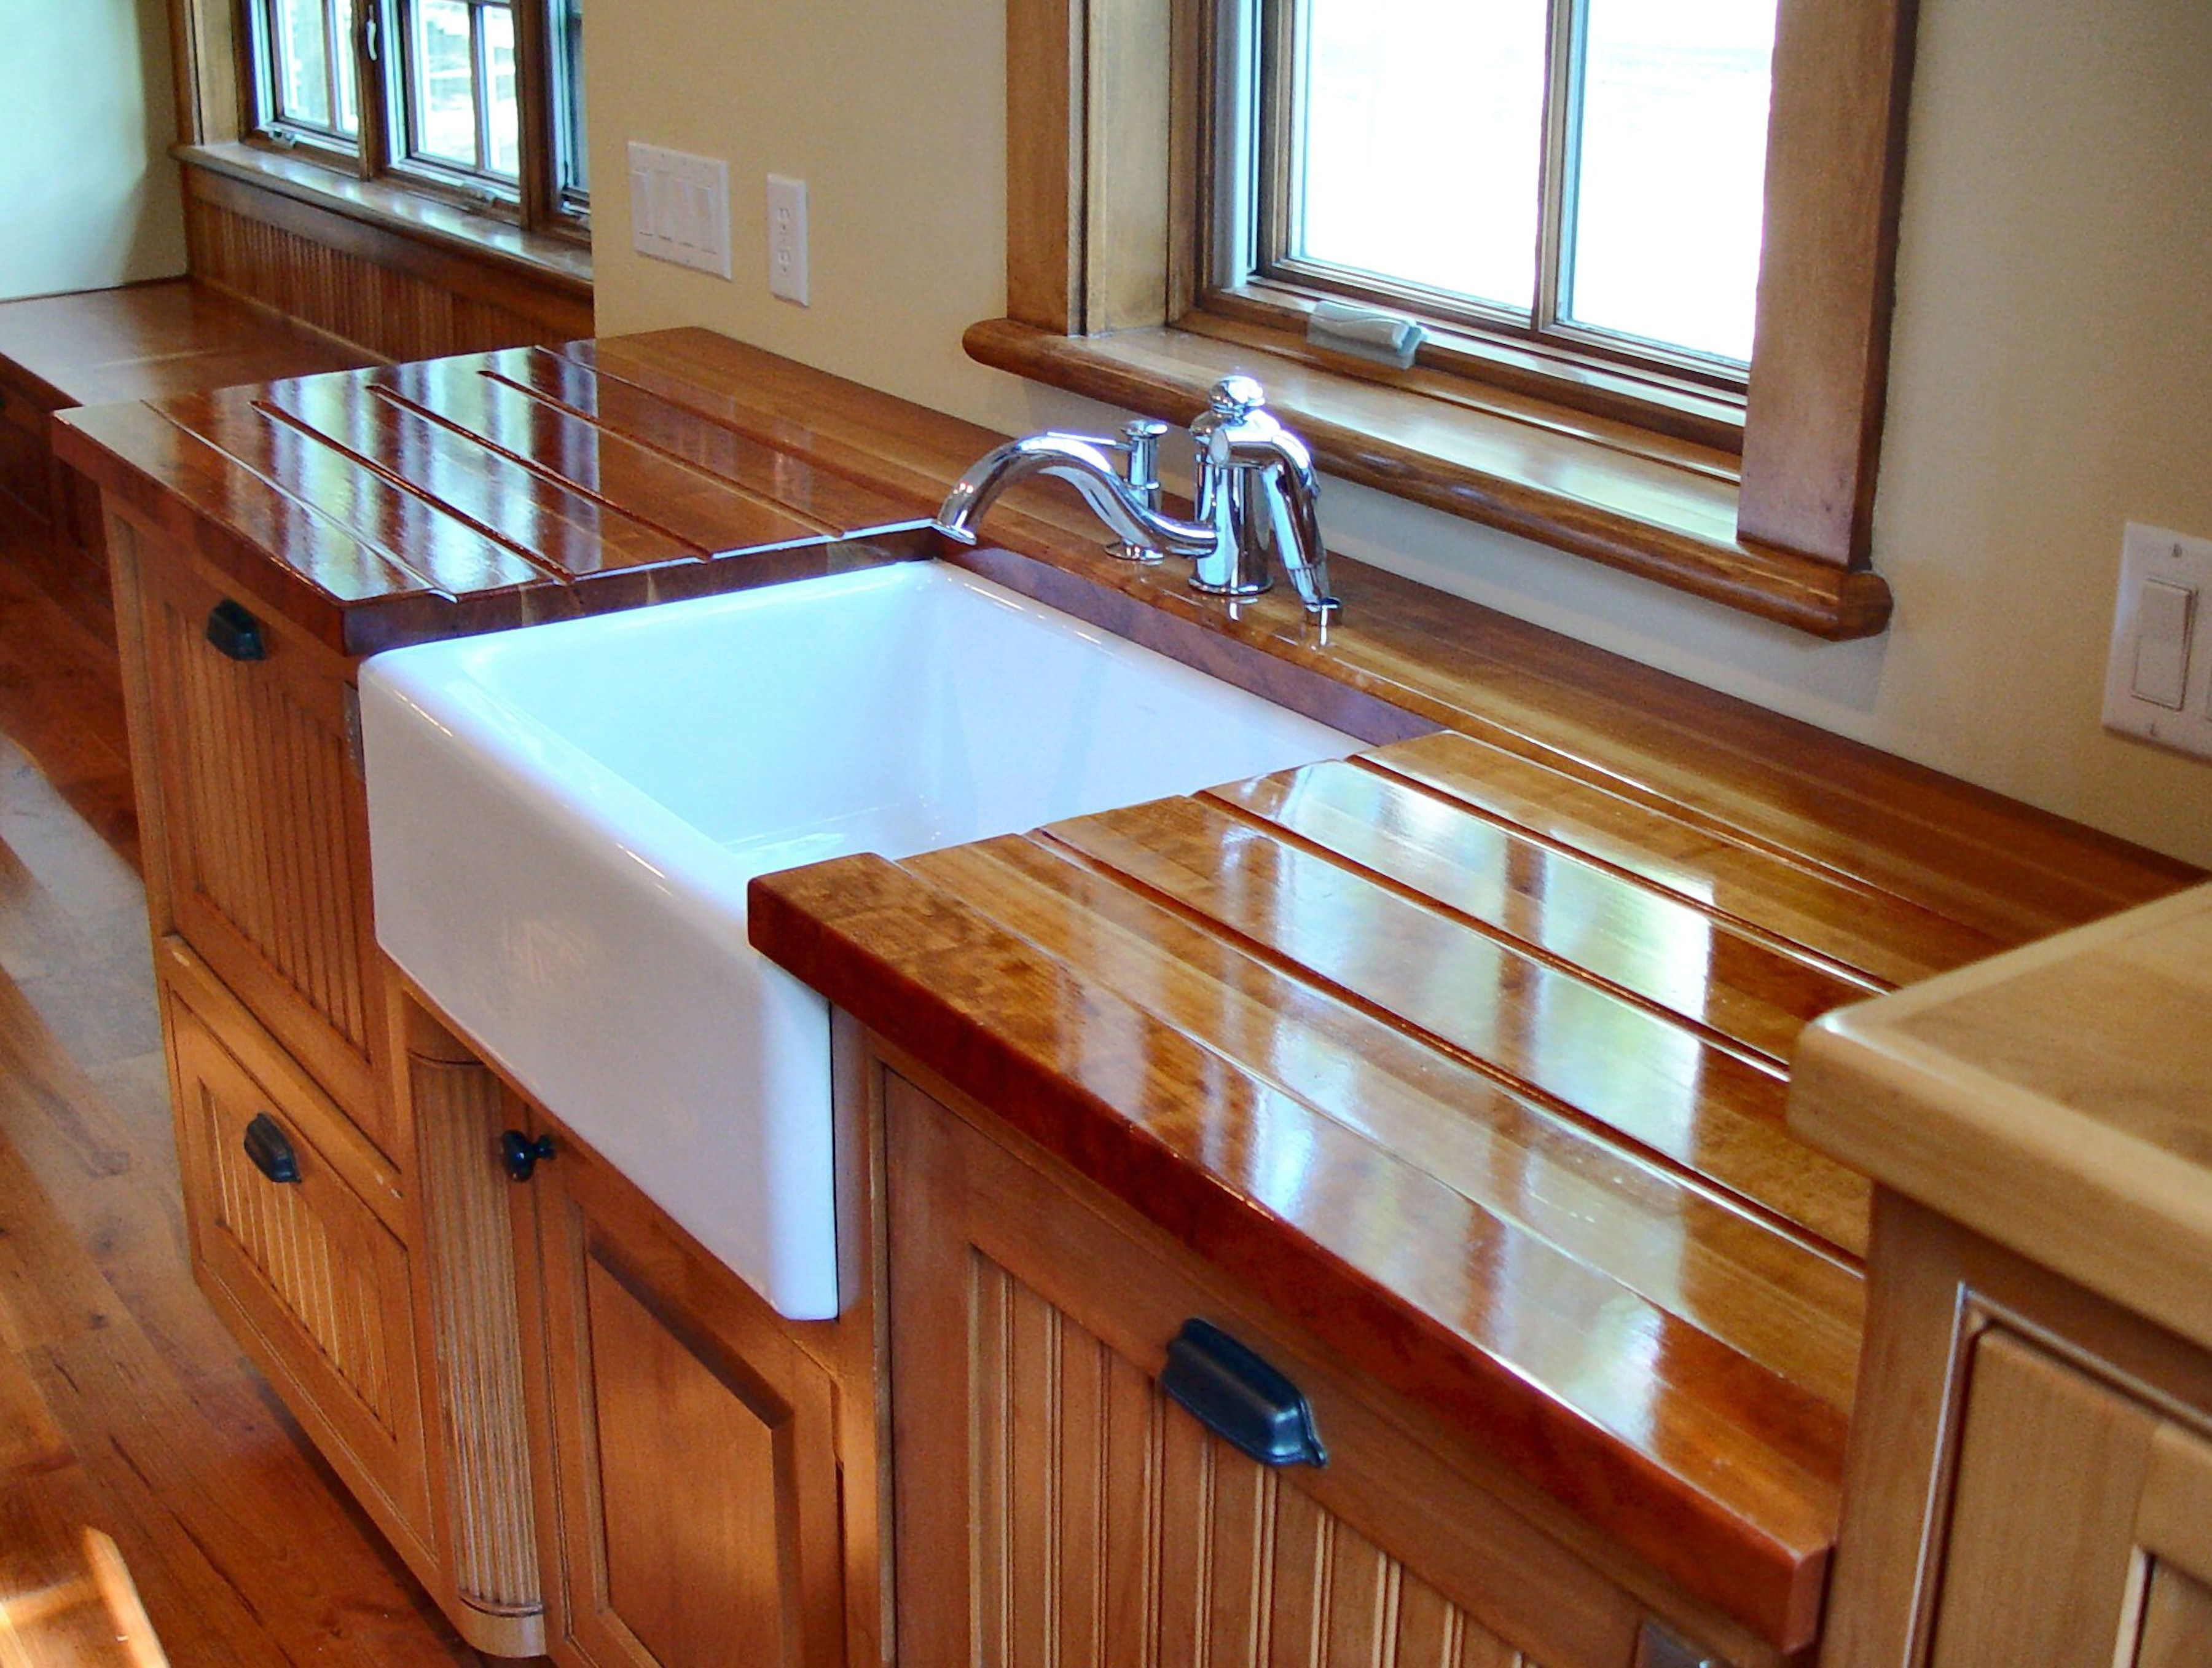 cutouts wood countertops kitchen Edge Grain Cherry Countertop with farm sink and Waterlox finish